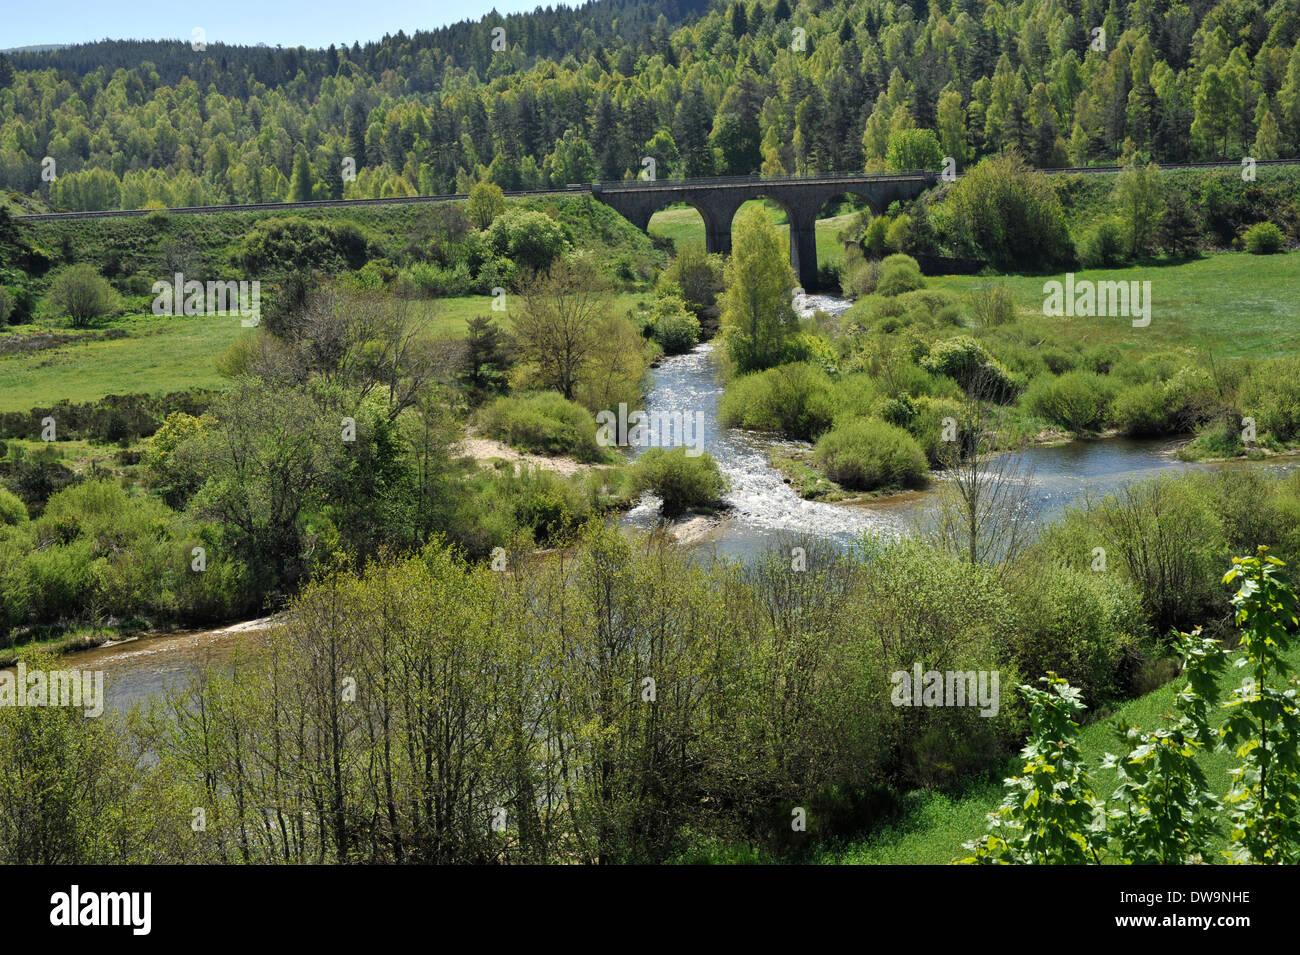 River Allier, Auvergne,  France - Stock Image